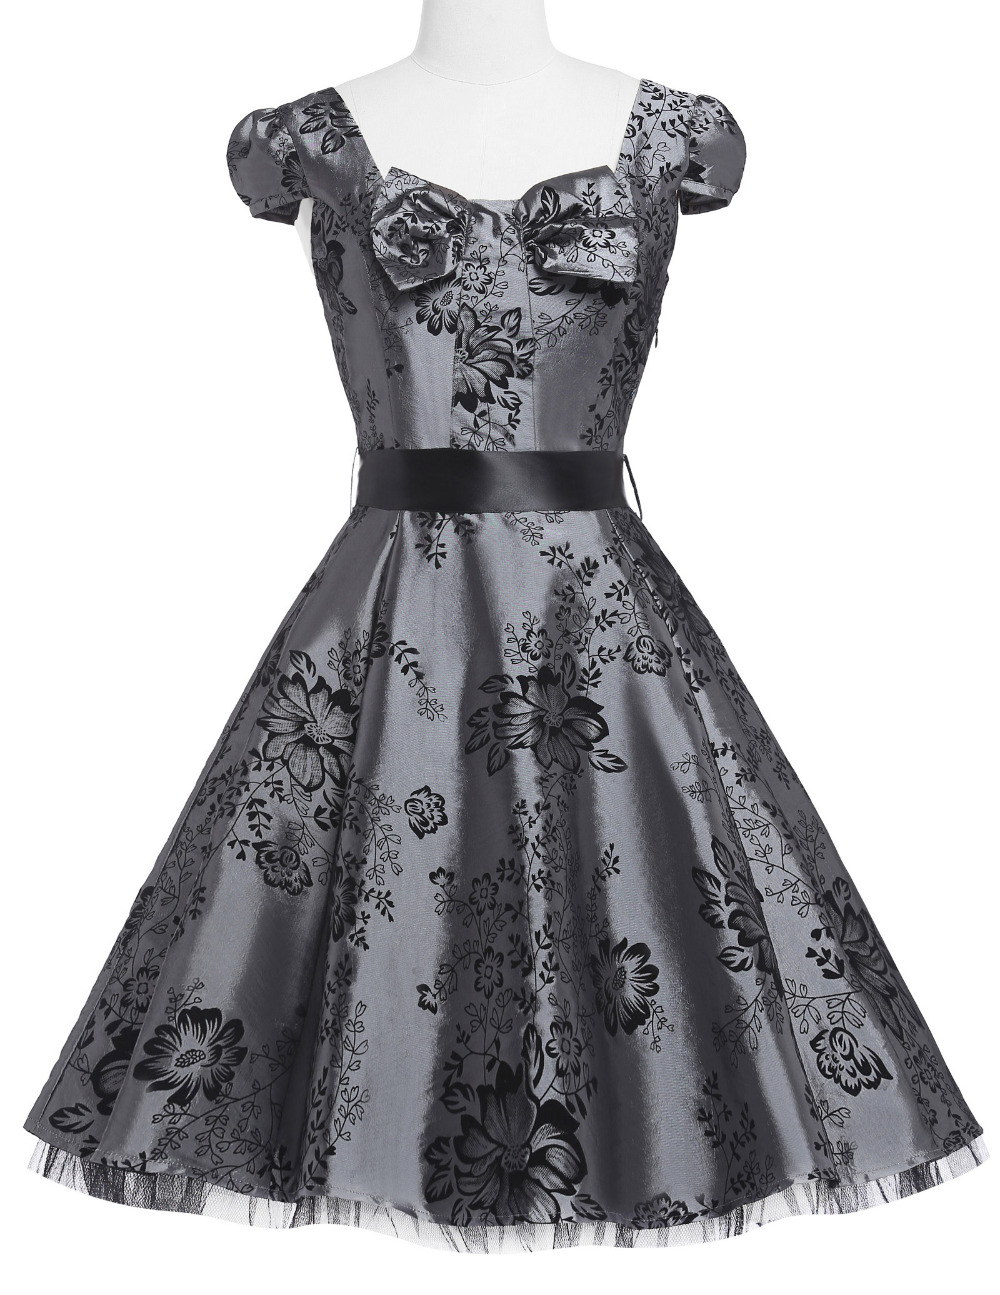 100% vraie image 50 s rockabilly robes jurken robe longue femme 2017 cap manches robe swing midi robe robes femininos pas cher